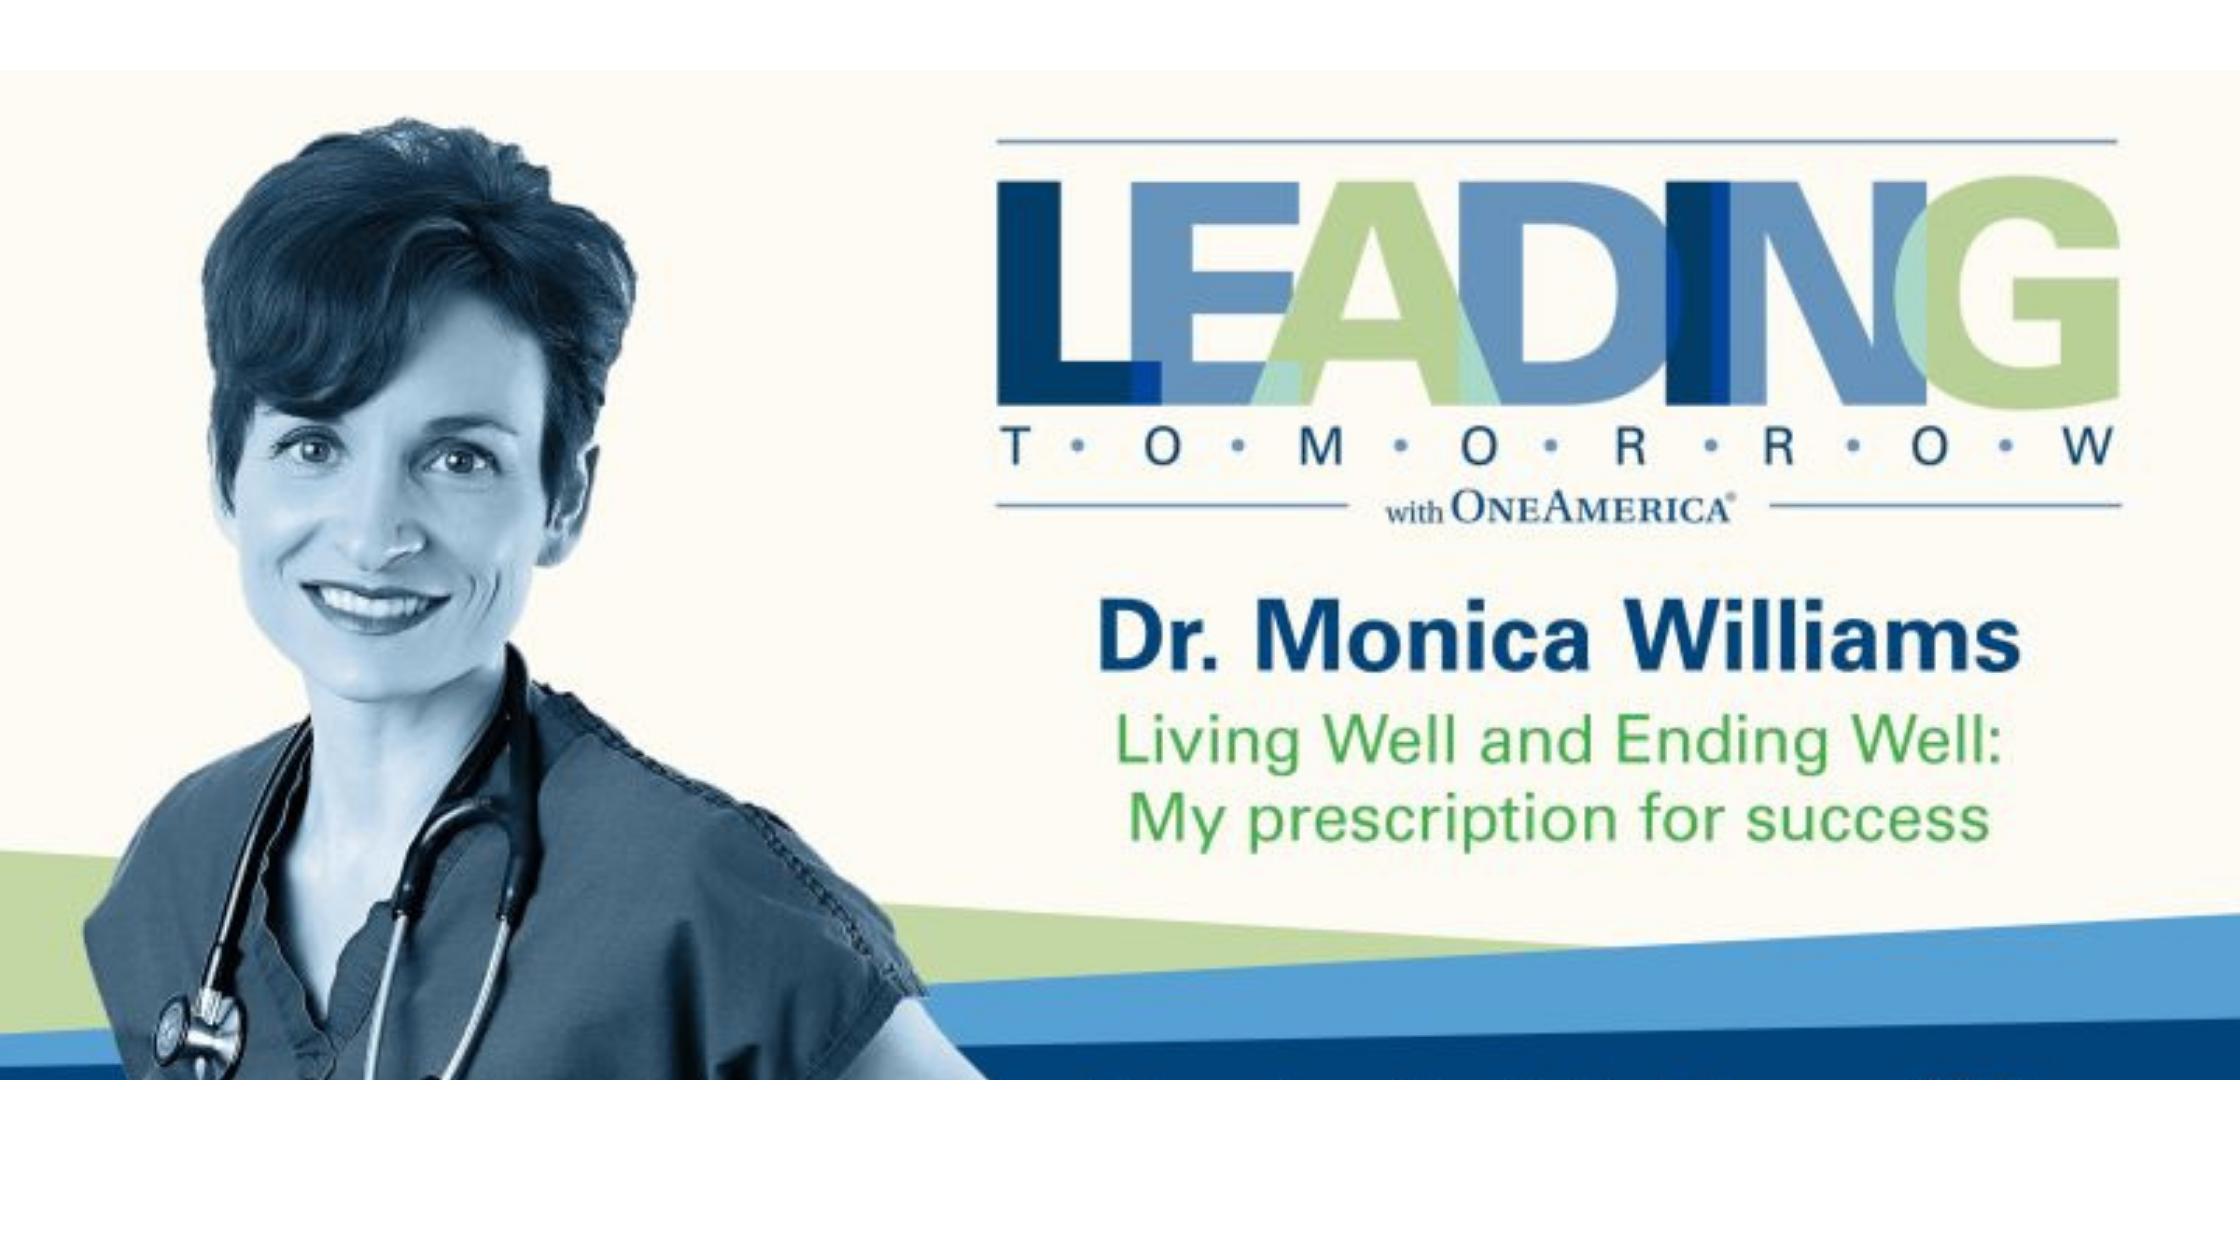 OneAmerica has Dr. Monica Williams presenting